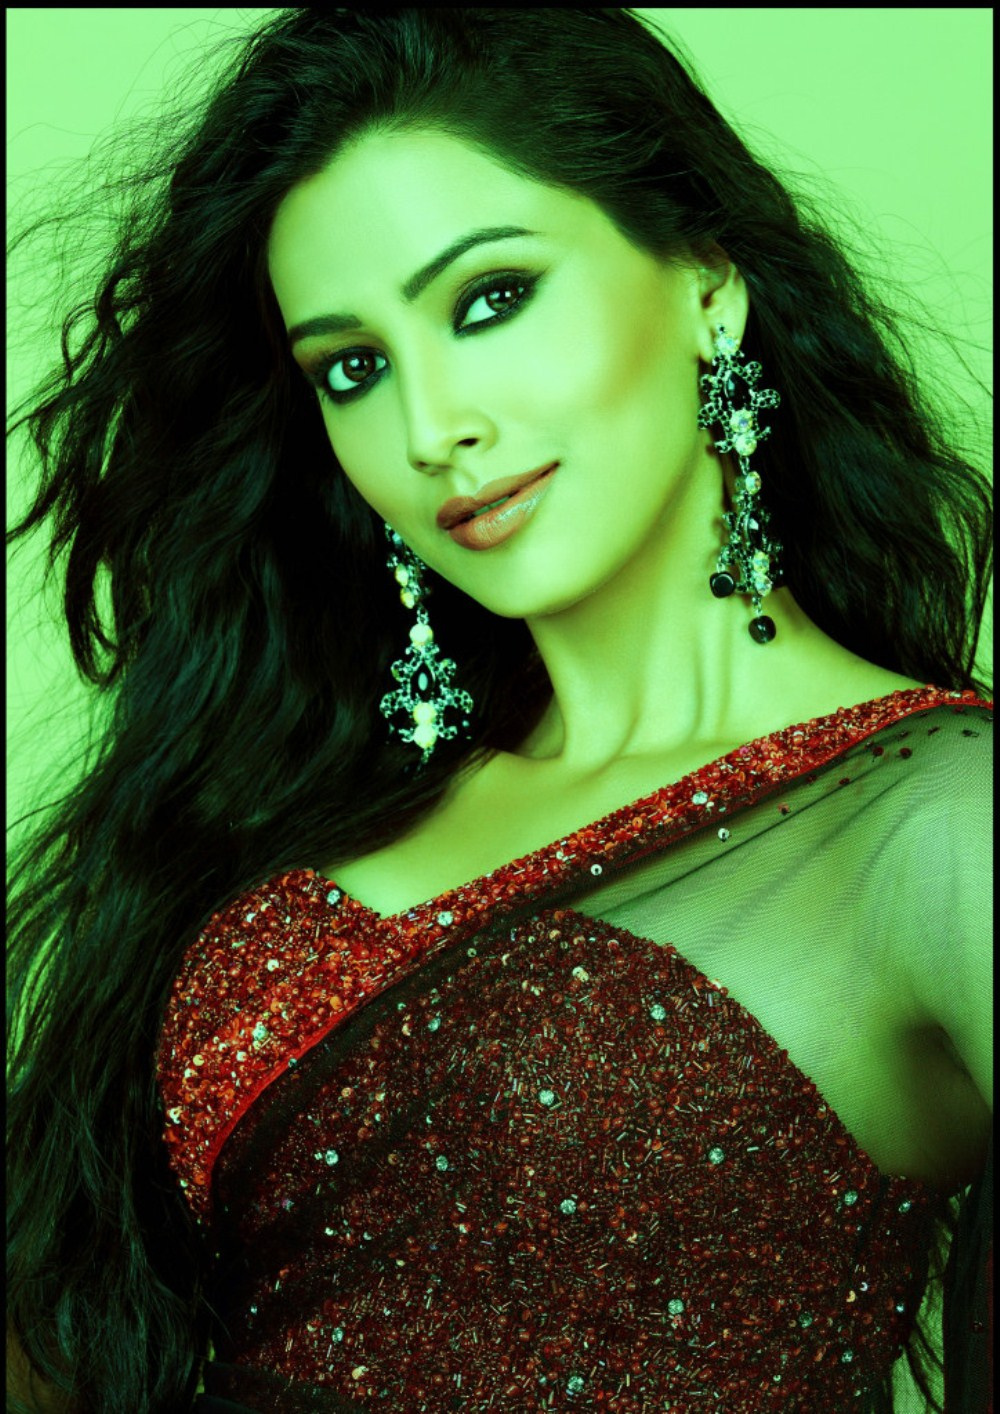 Pallavi Subhash Photoshoot 25cineframes